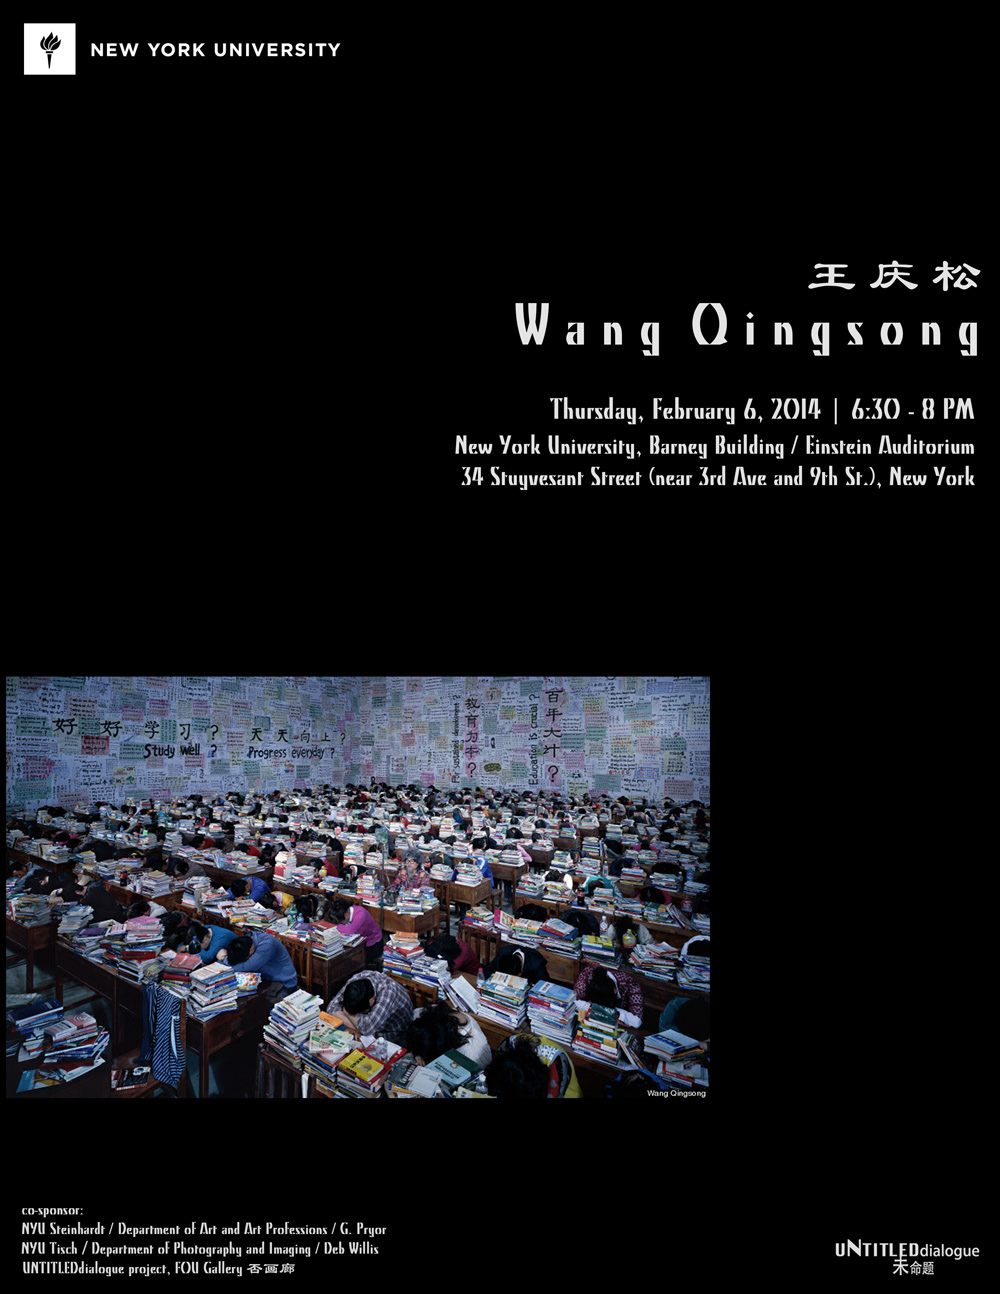 UD14_poster_Wang-Qingsong.jpg